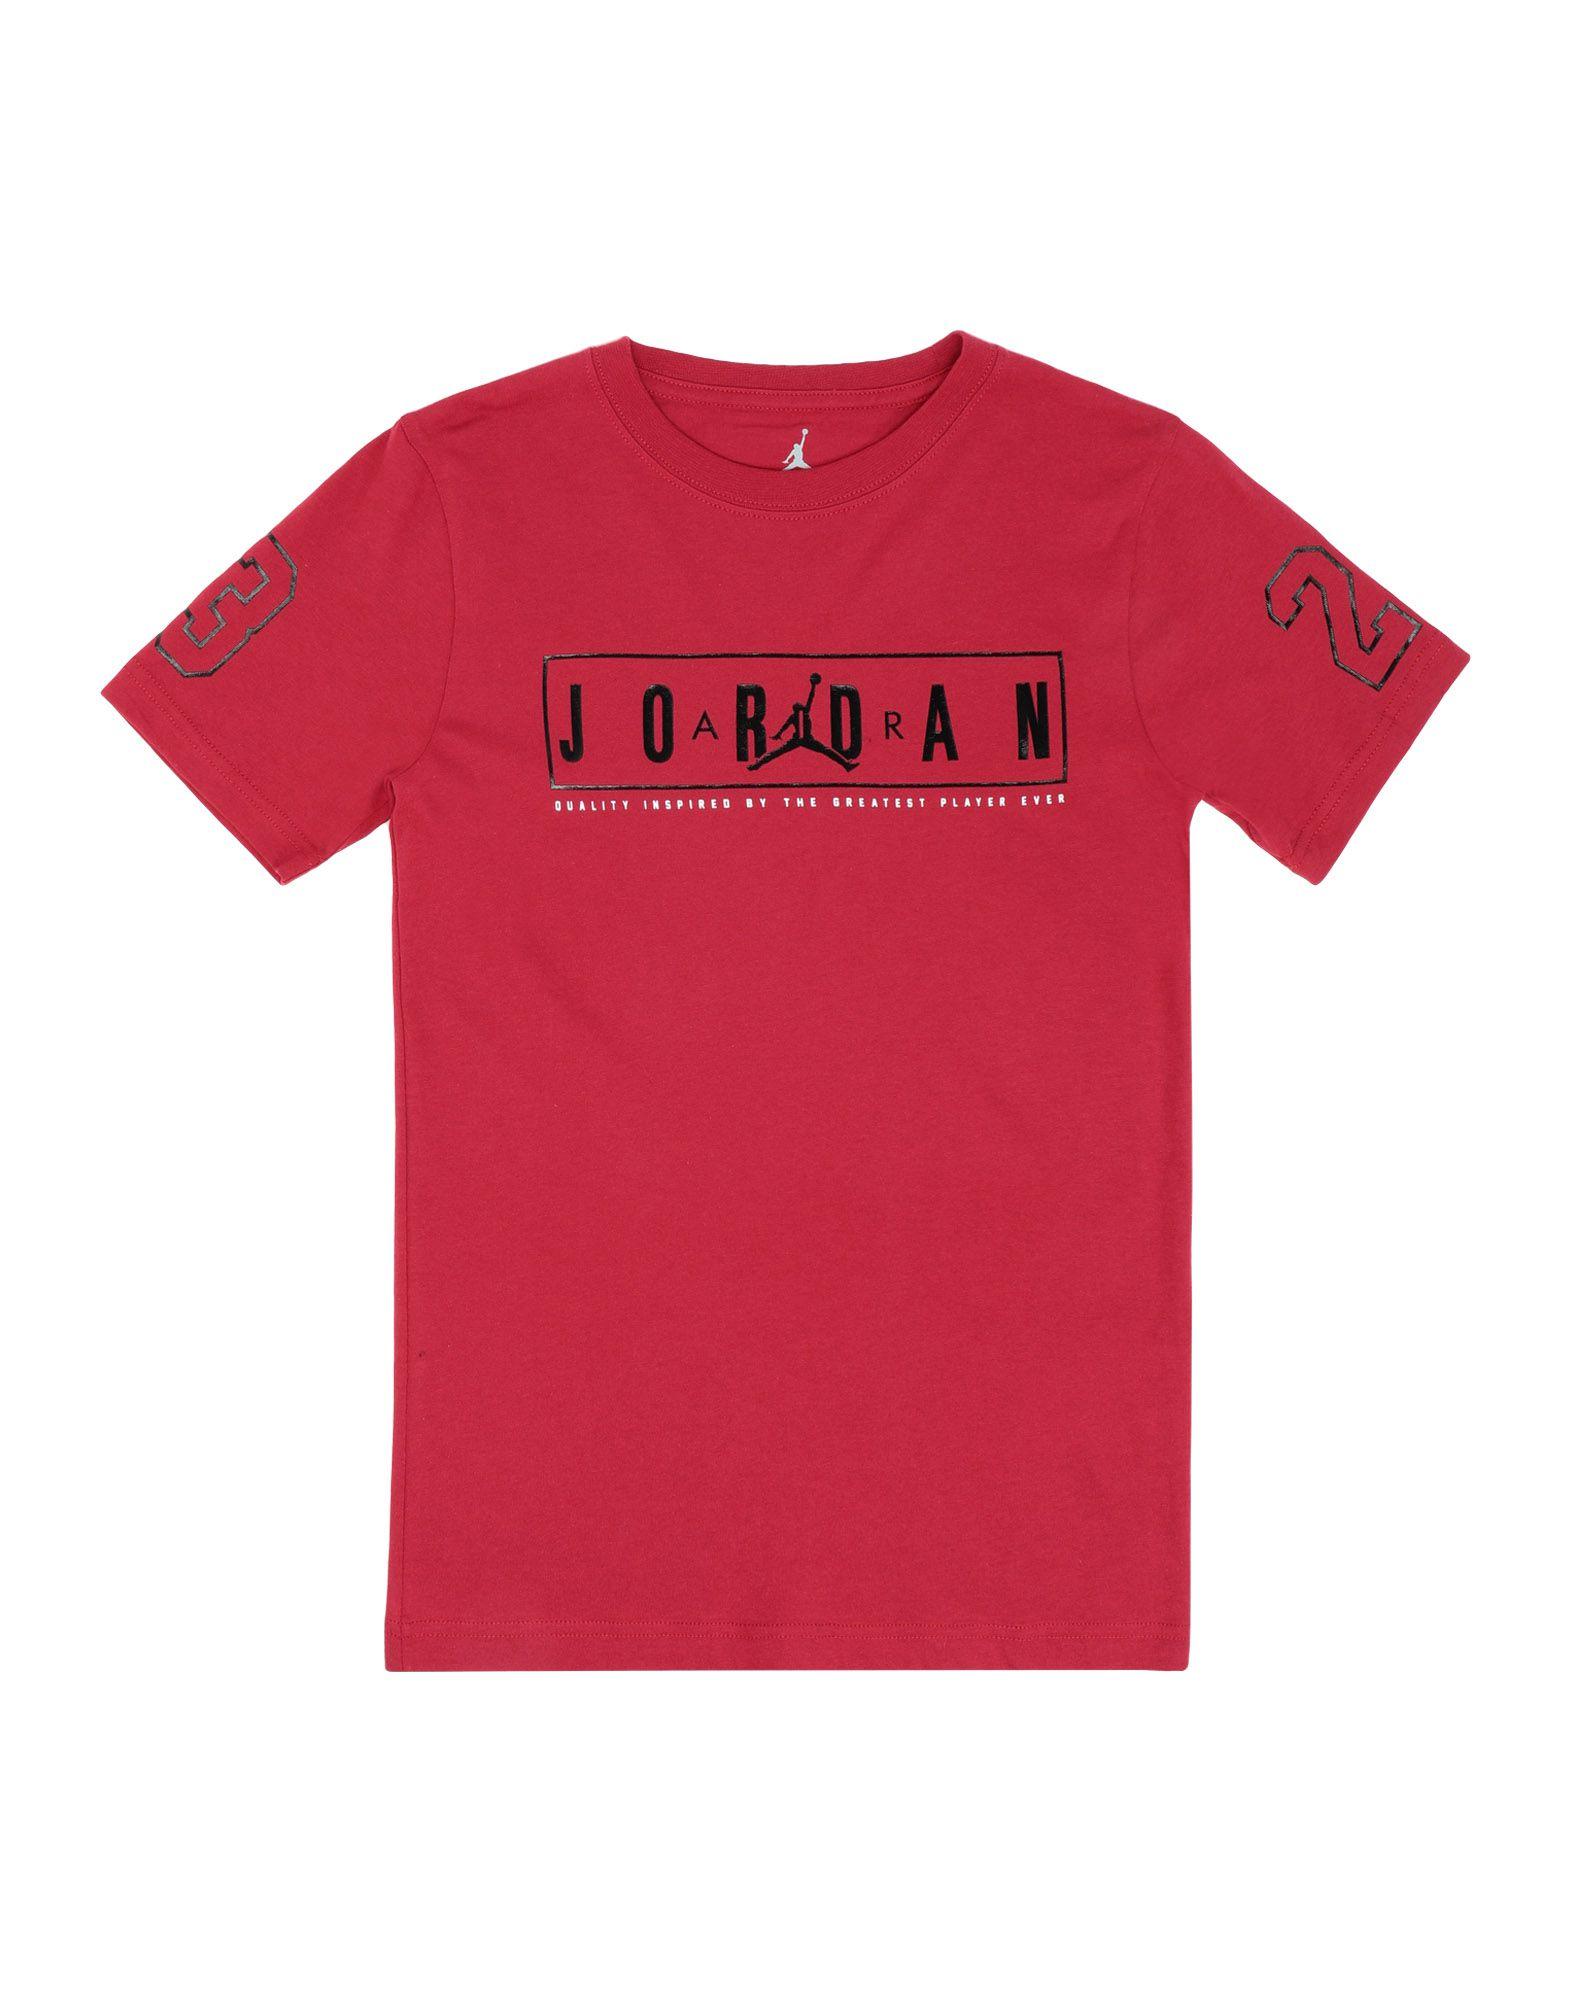 6f35cc1e22a2b5 Jordan Spizike Shirts Match Shoes - Sneaker Threads